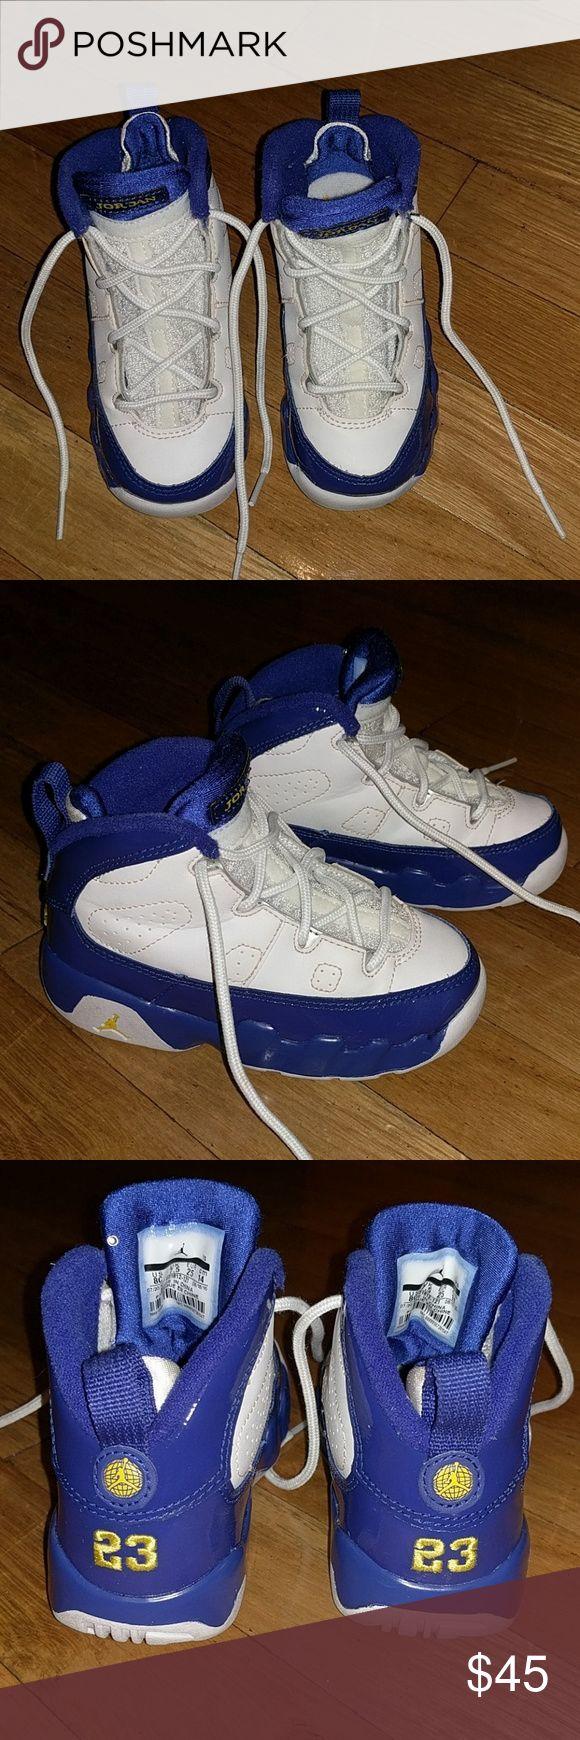 Toddler Jordan 9's size 8c Blue & white Jordan 9's size 8c Jordan Shoes Sneakers